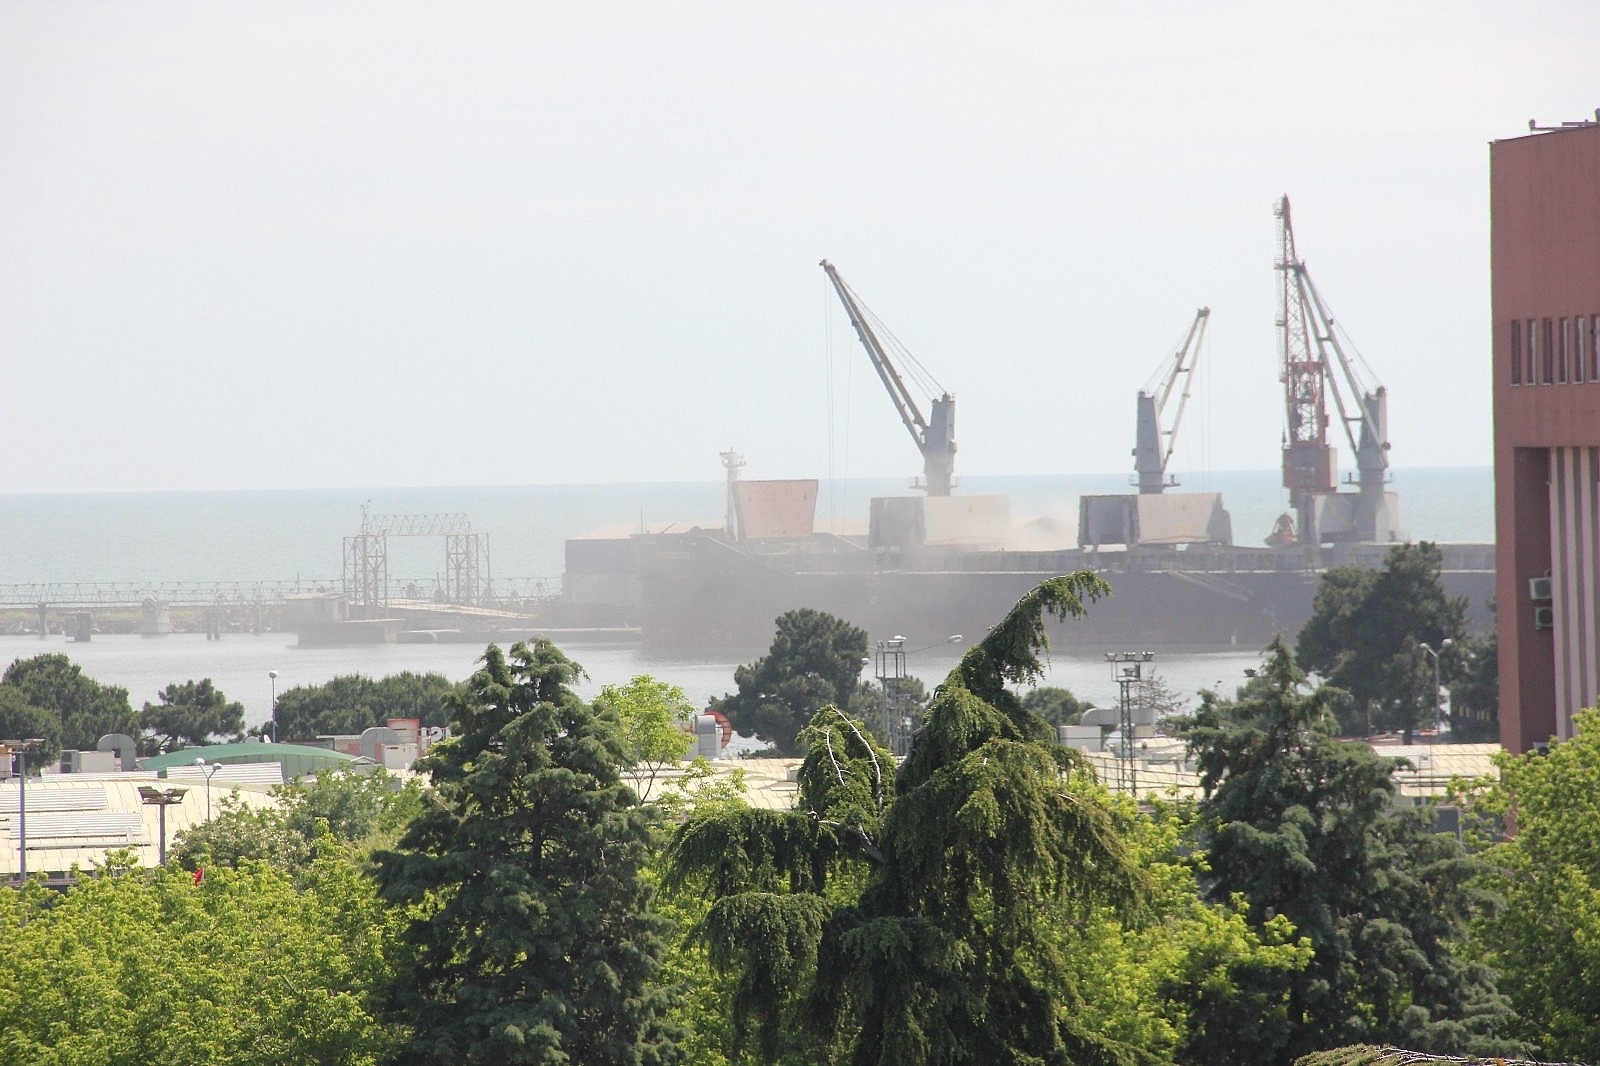 2021/06/samsun-limaninda-toz-dumana-karisti-20210605AW33-3.jpg